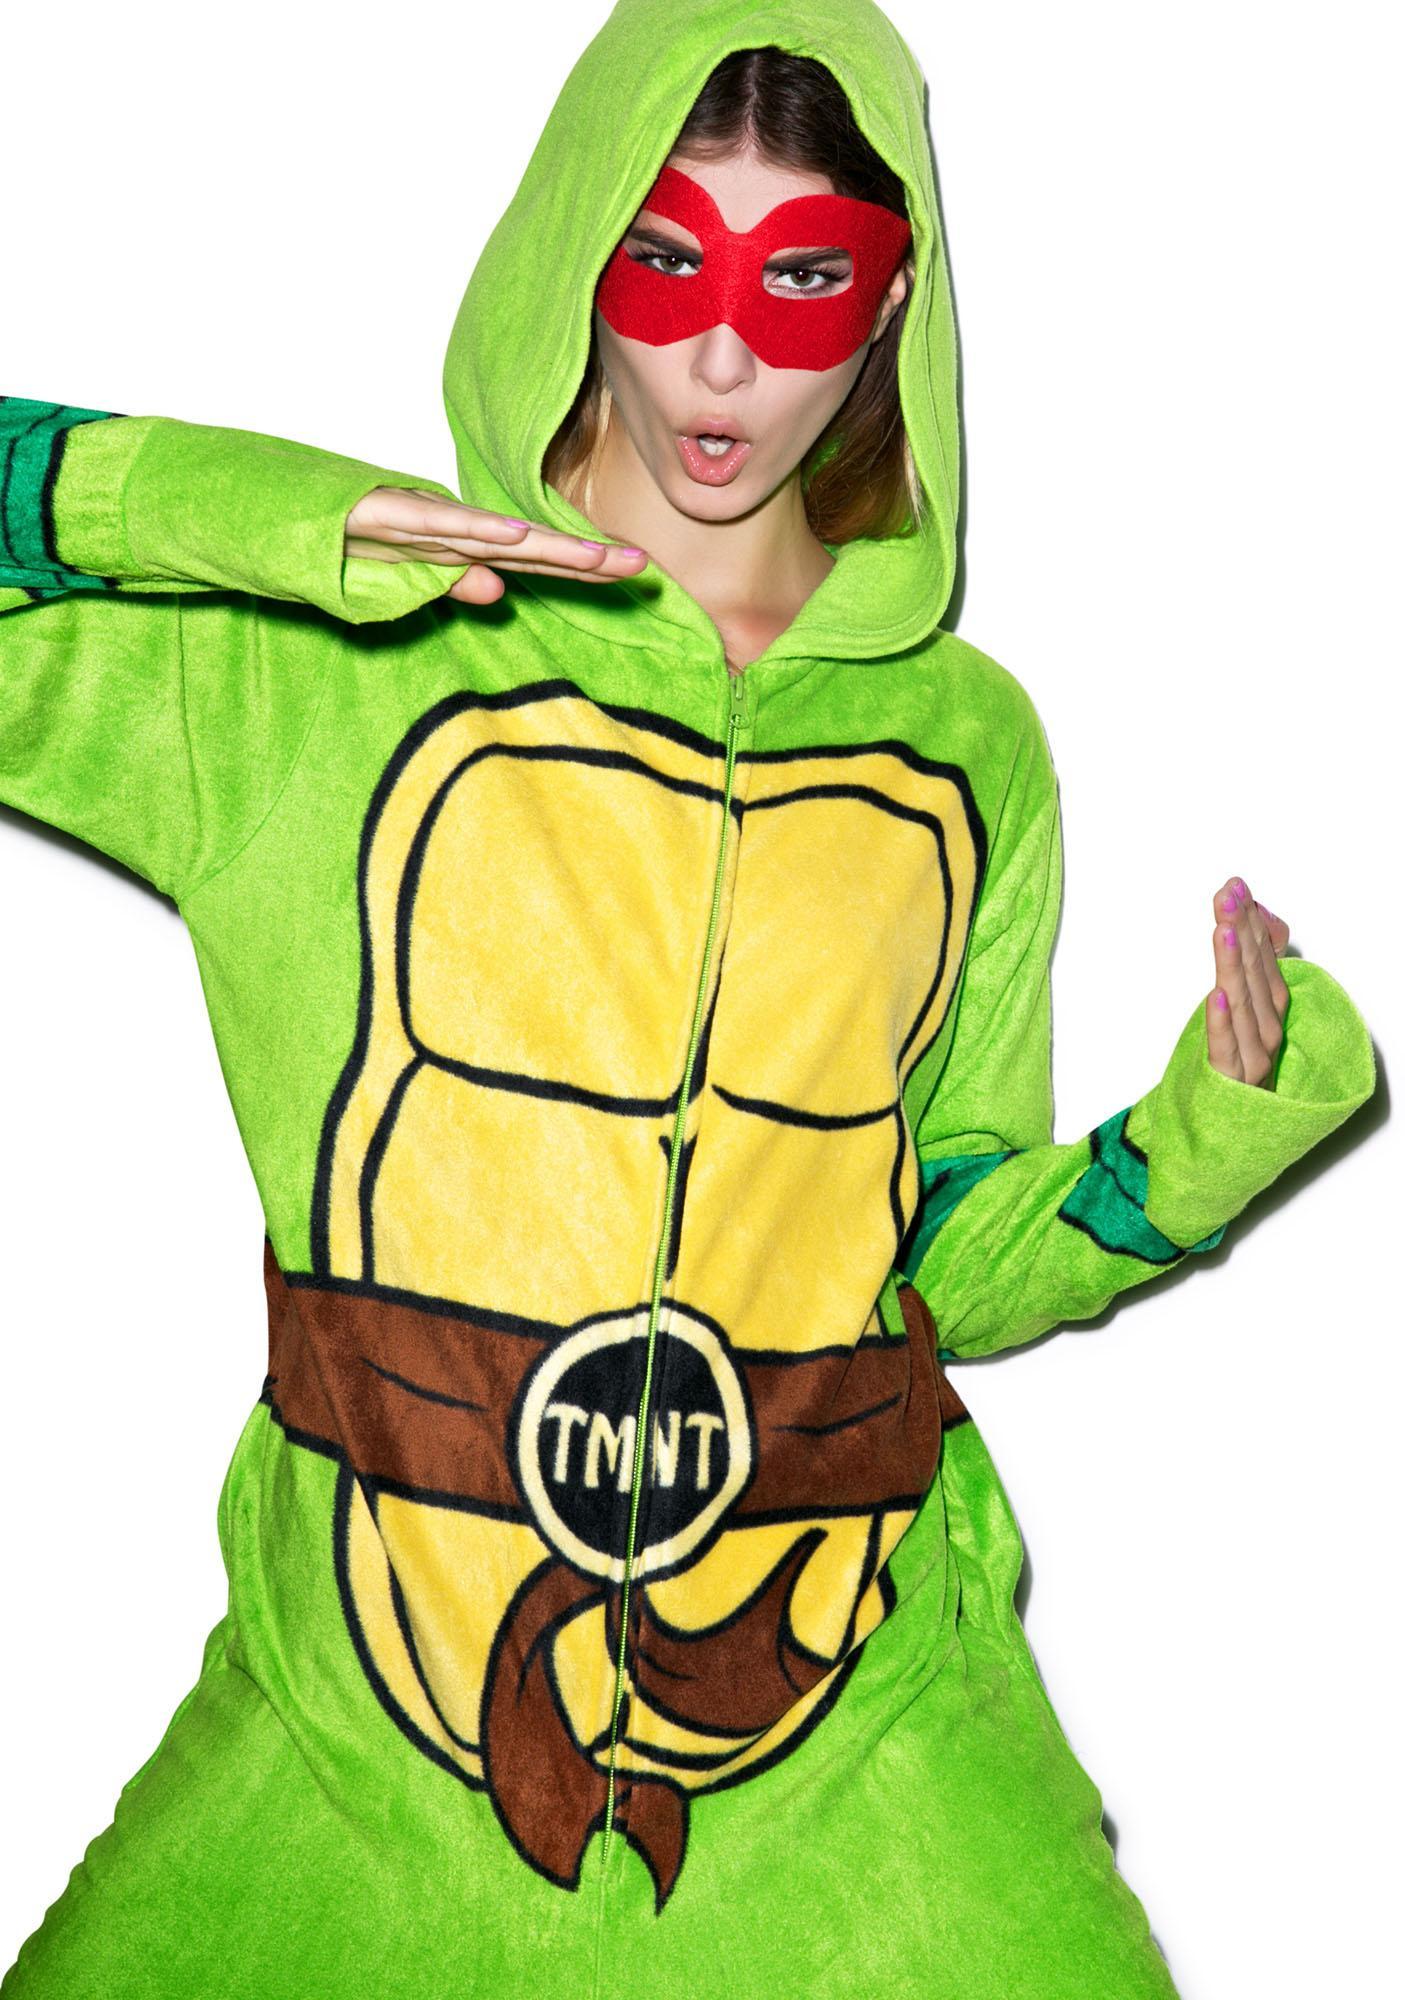 Undergirl Teenage Mutant Ninja Turtles Hooded Onesie